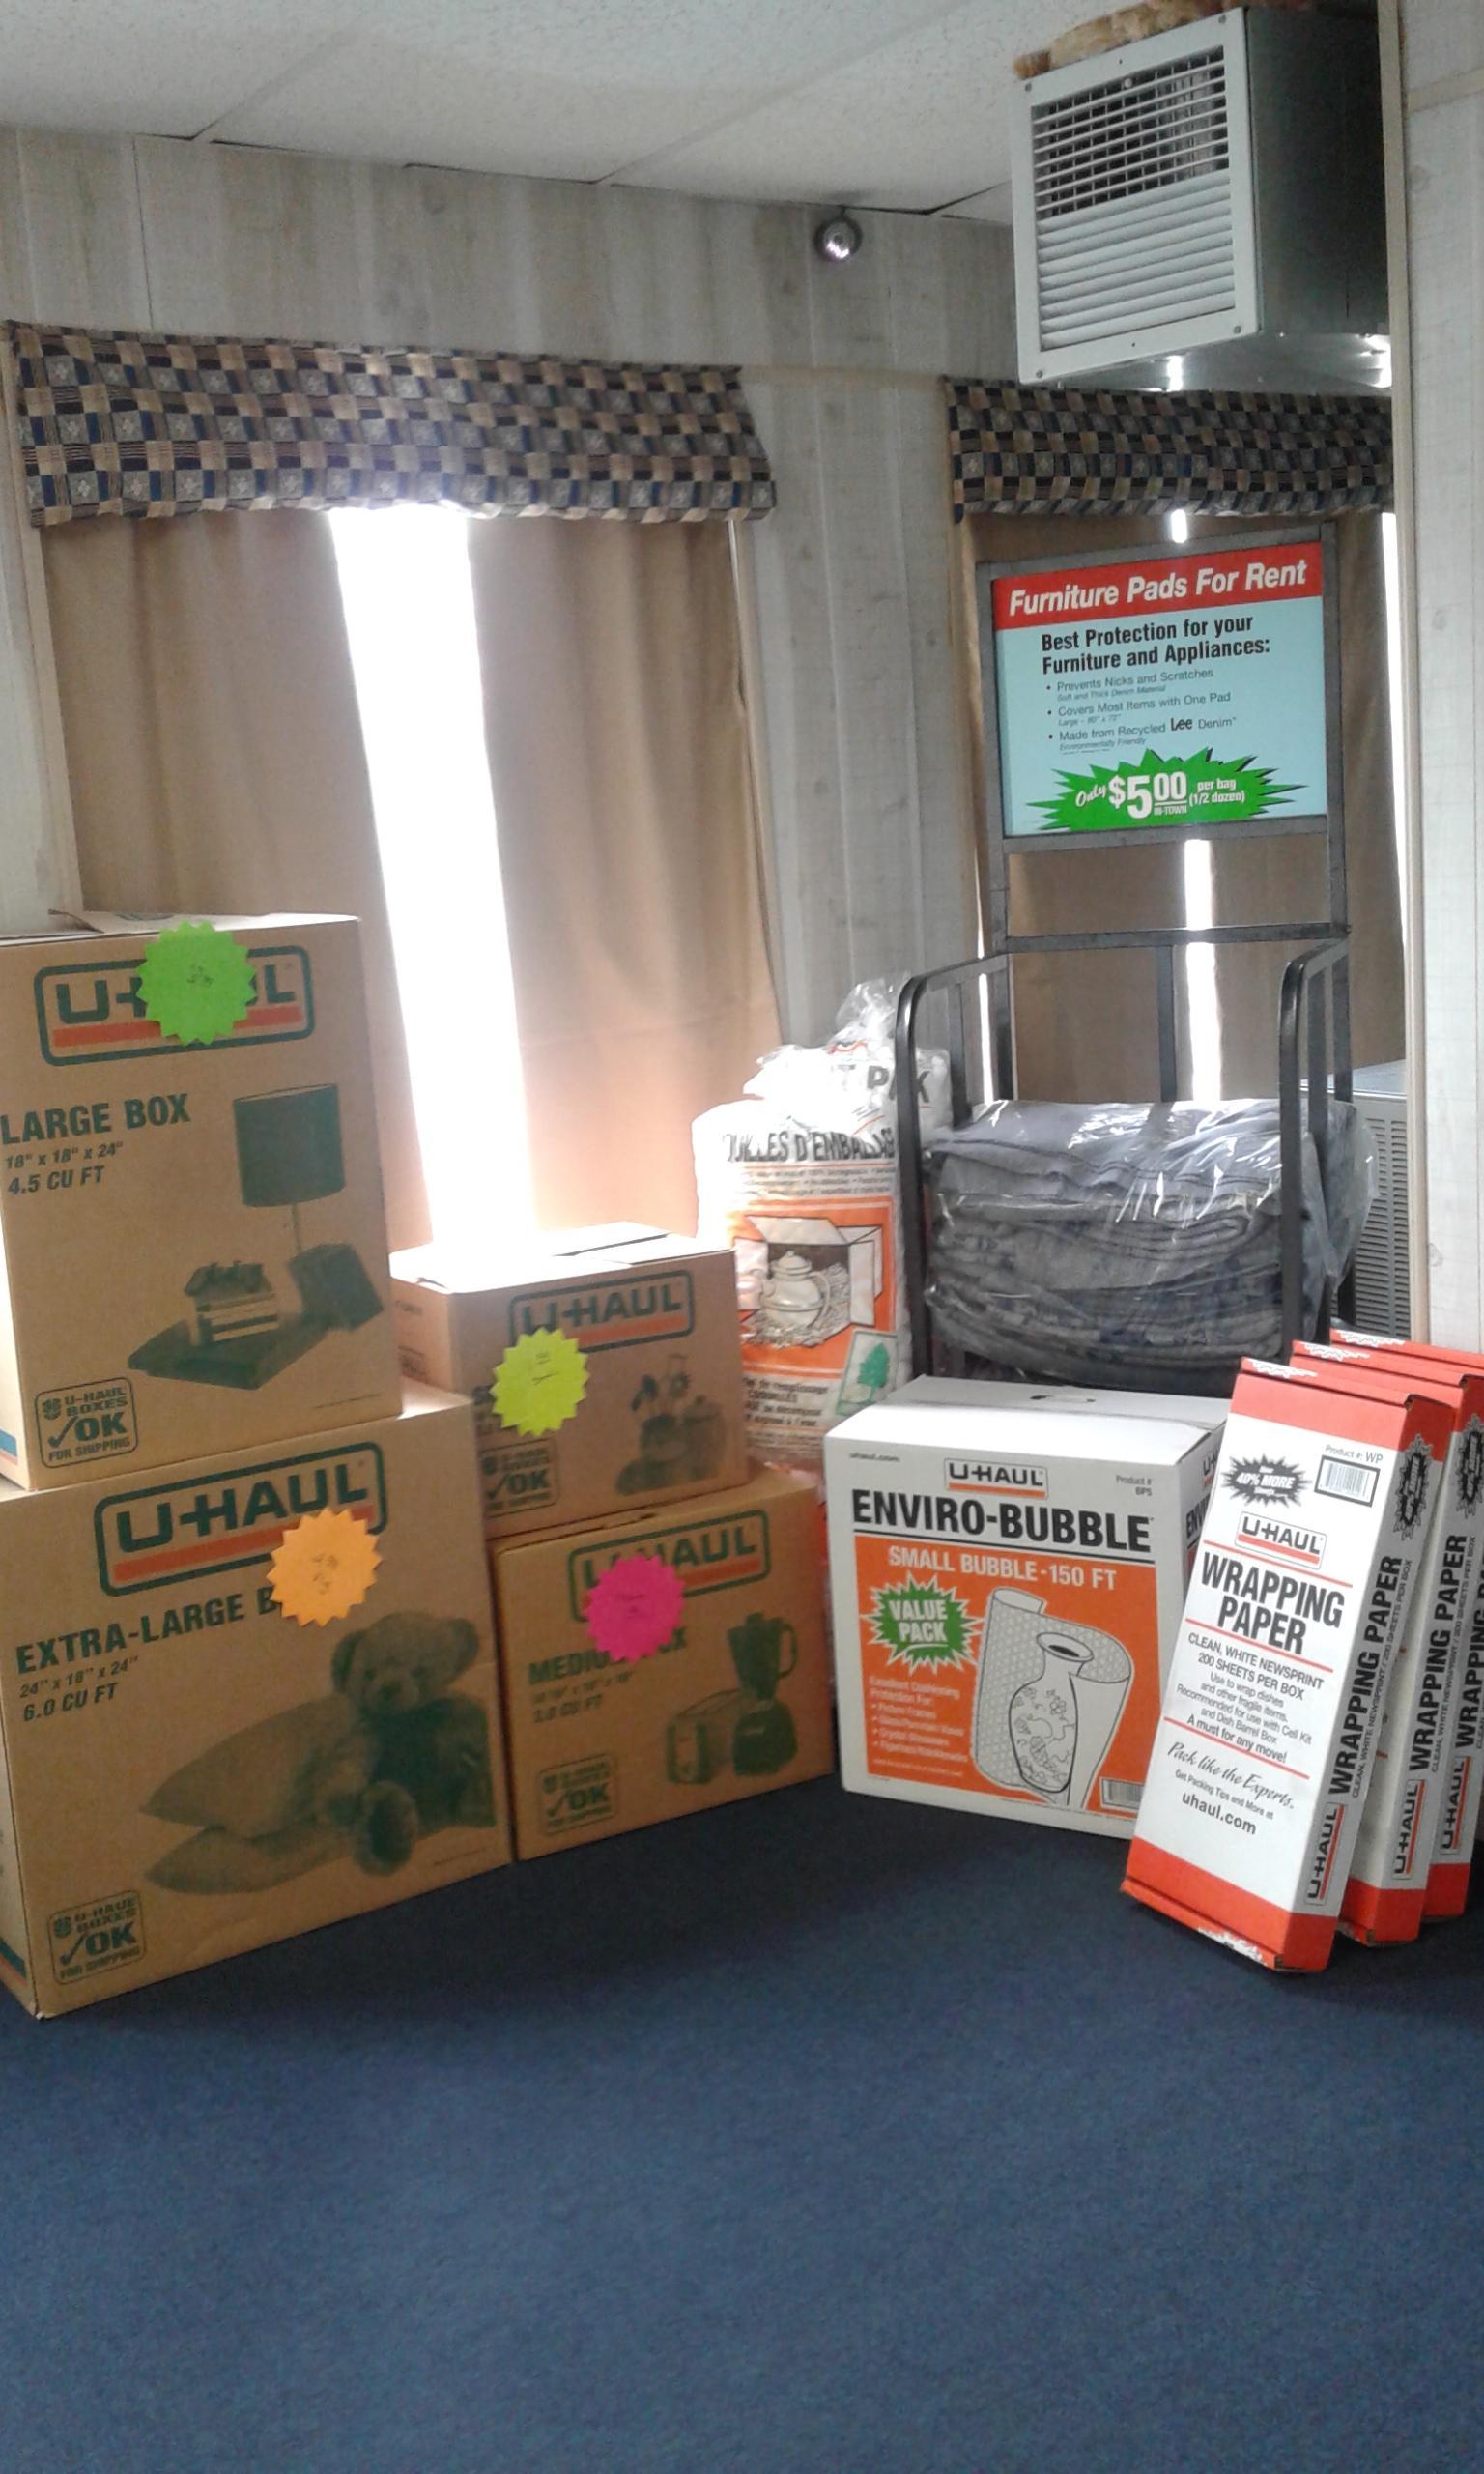 U-Haul Moving Supplies